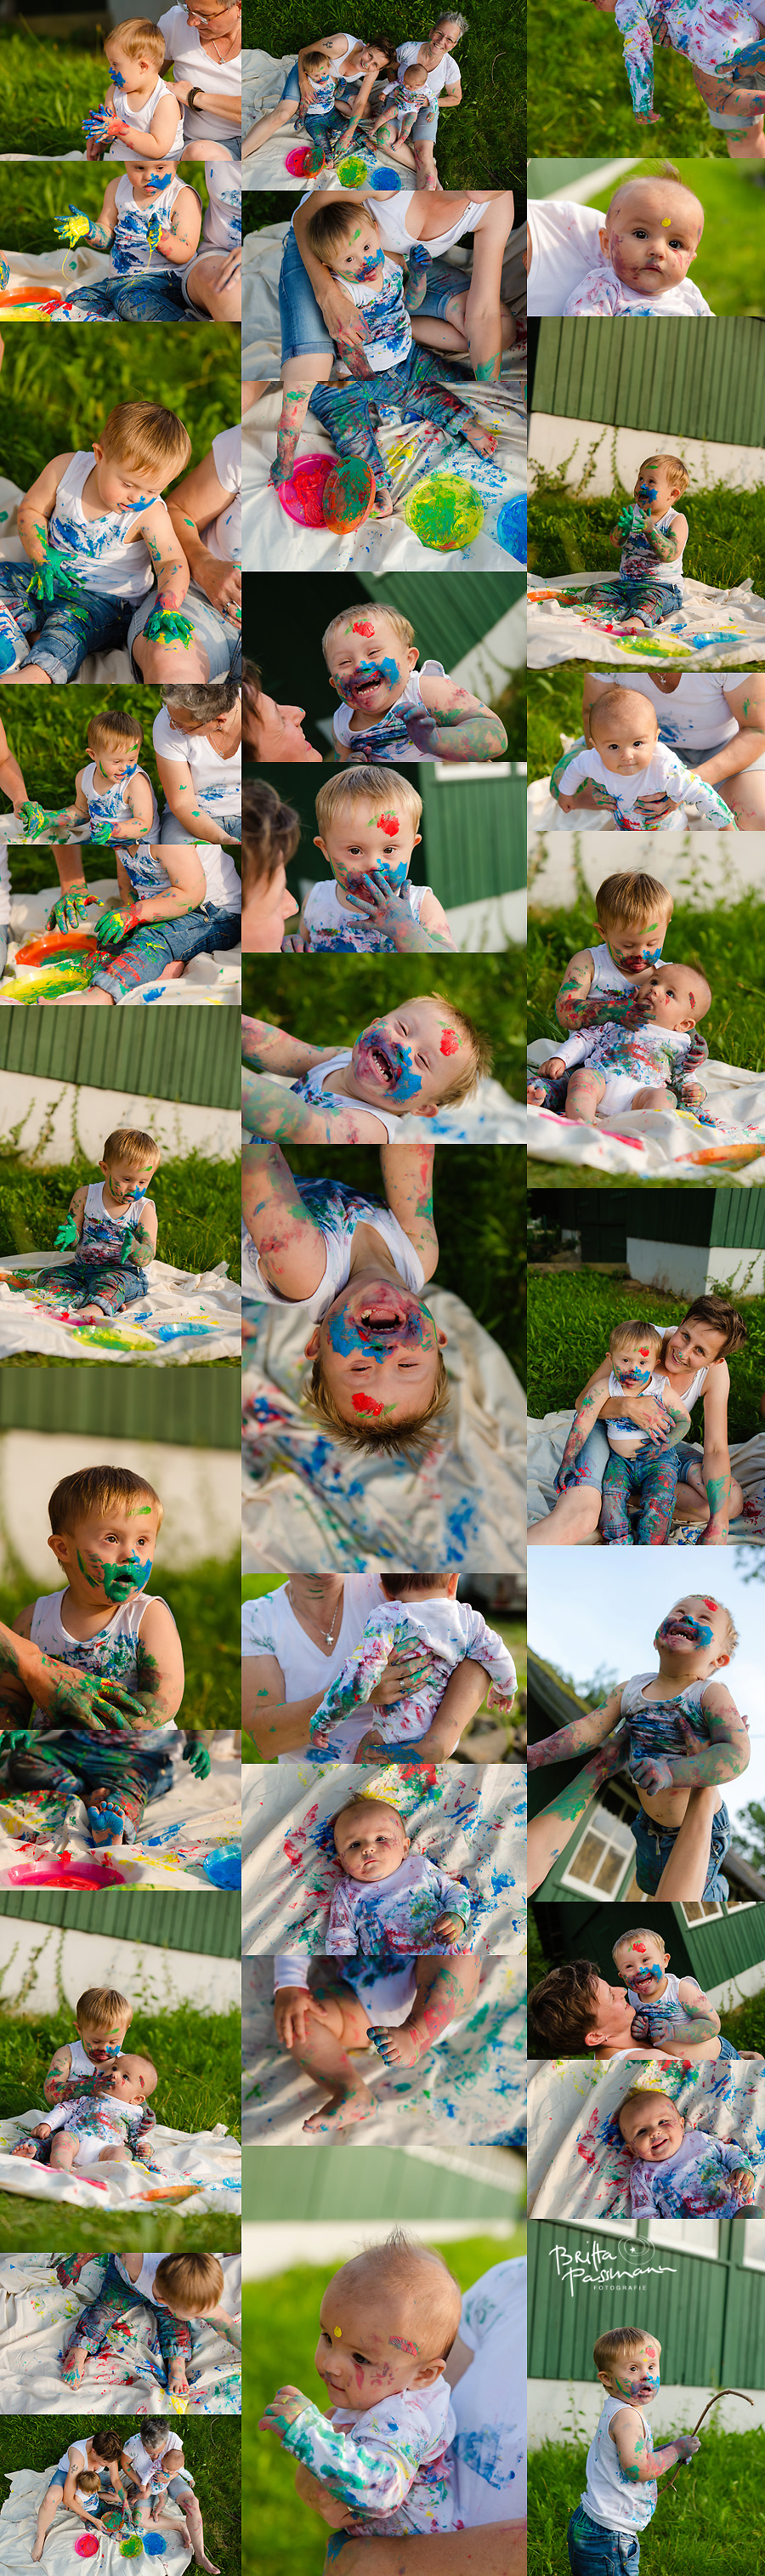 Worlddownsyndromeday-Fotoshooting-dortmund-kinderfotos-fingerfarben